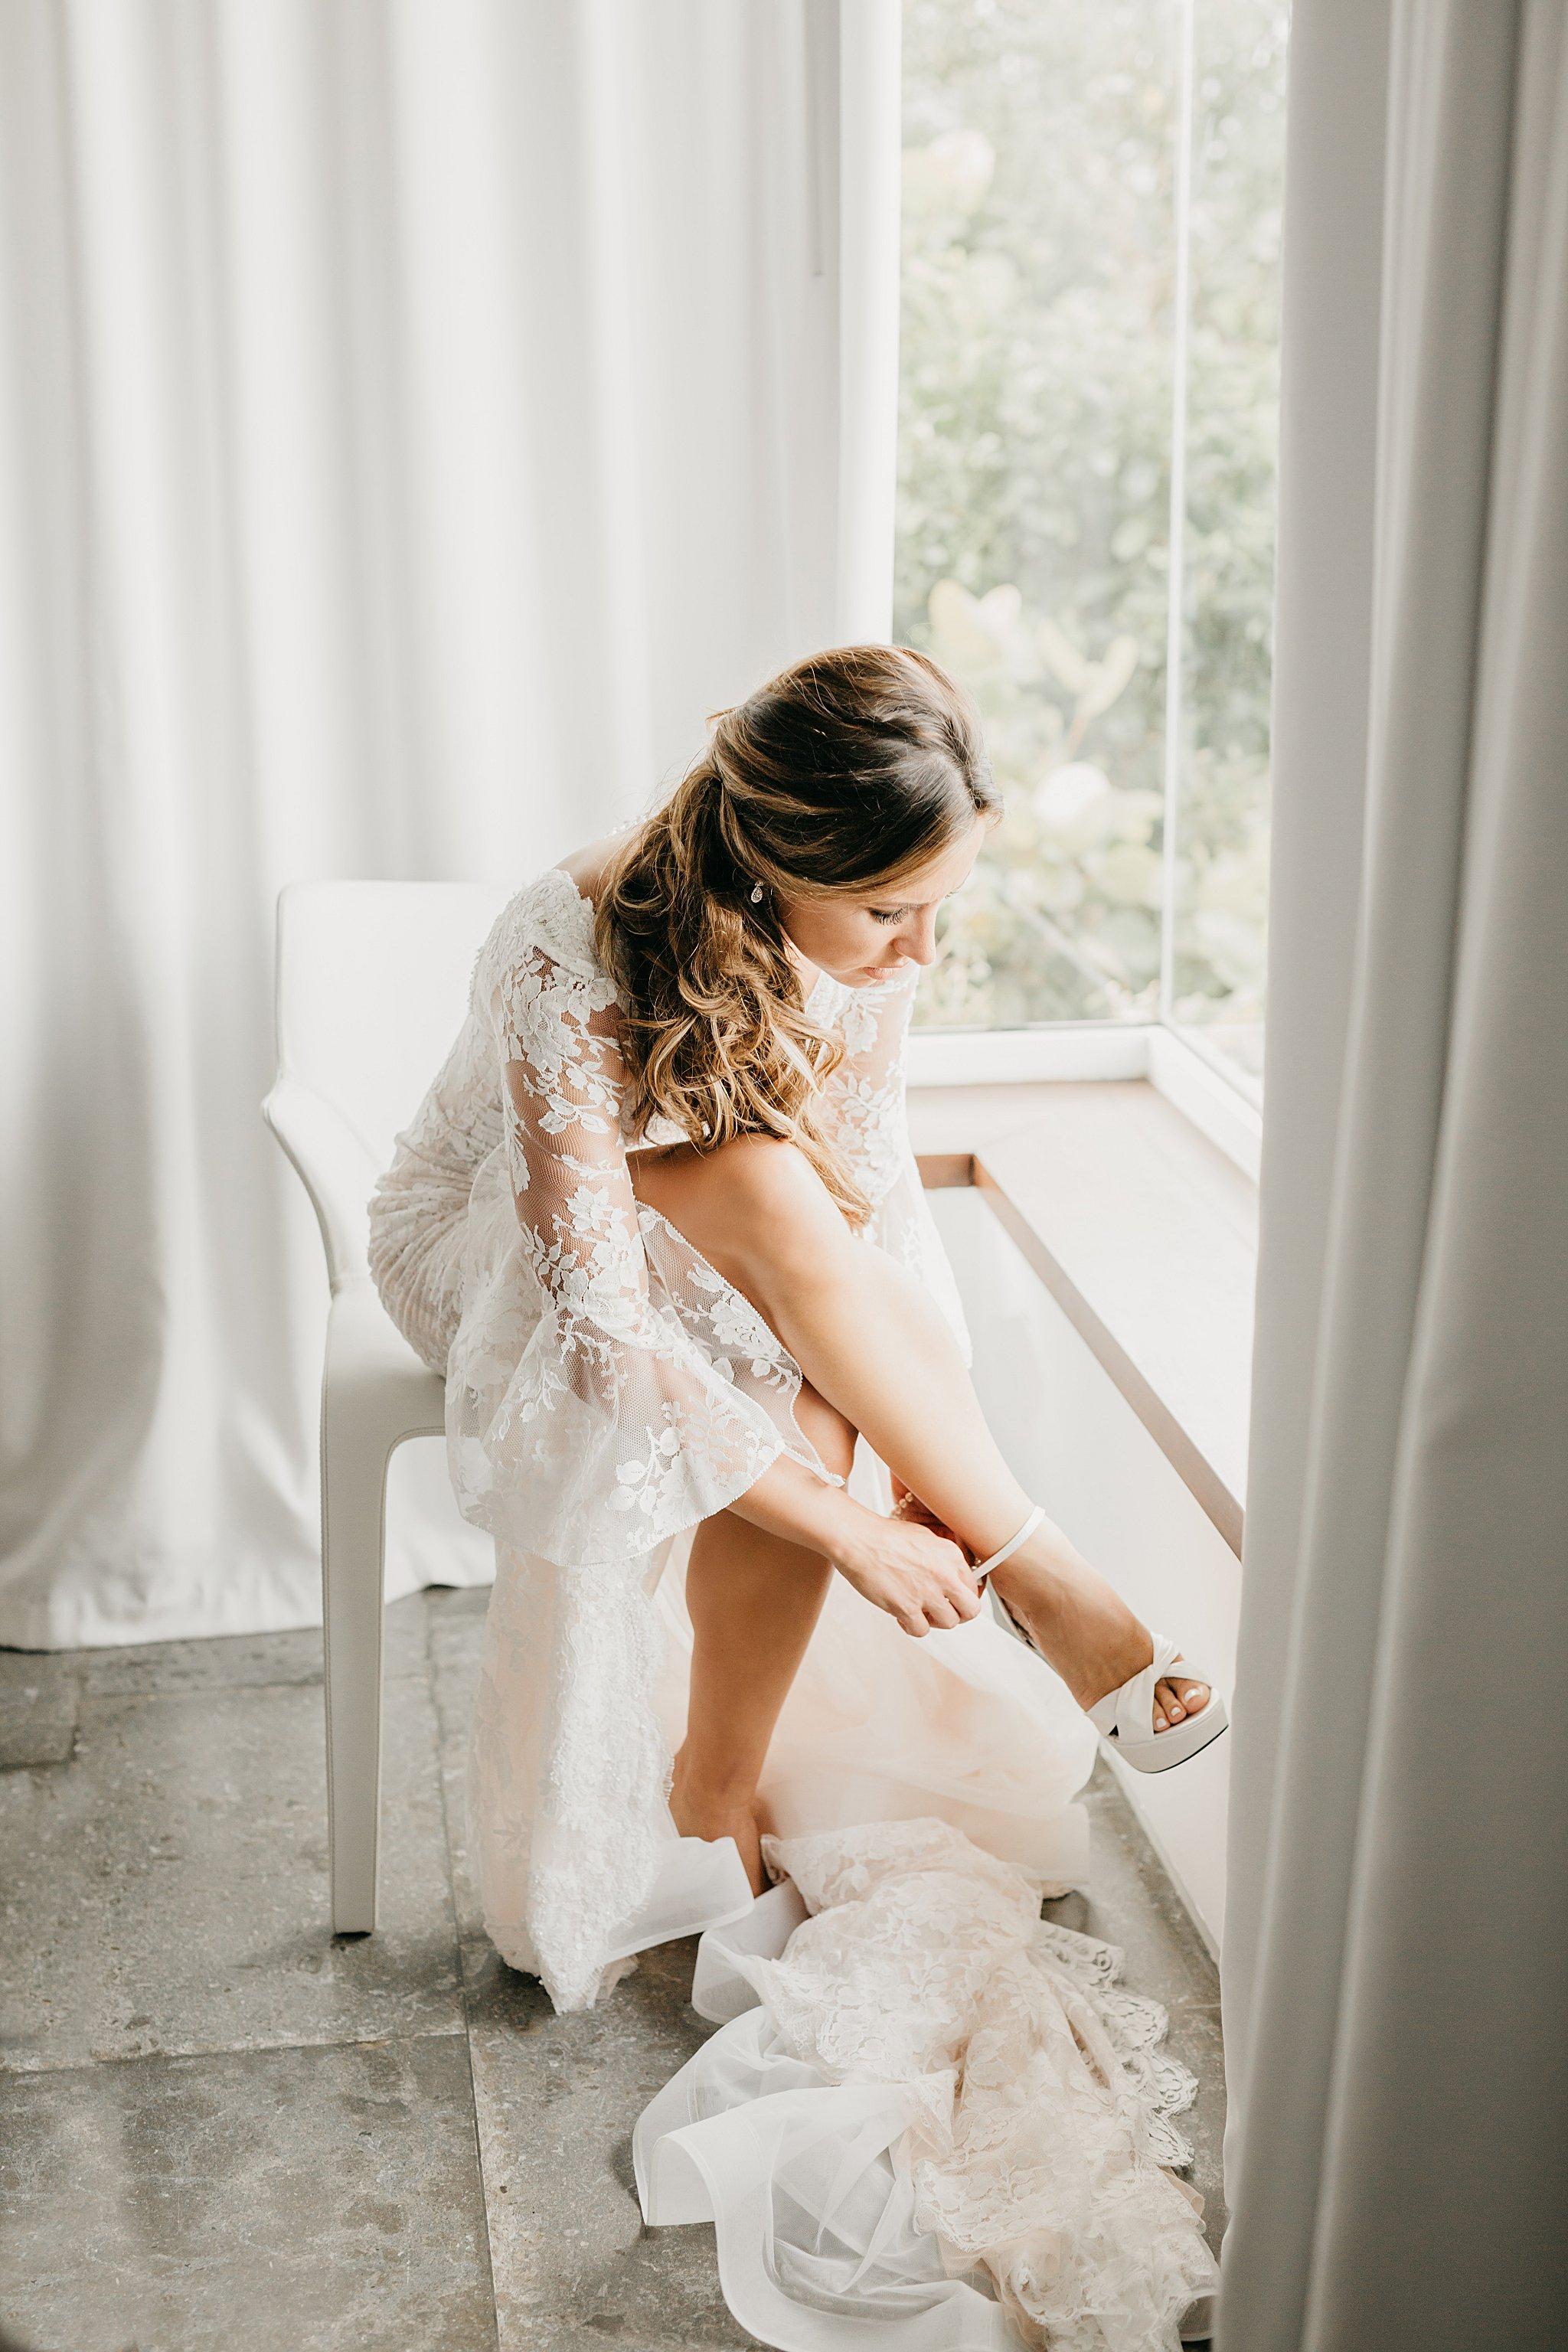 JessicaBordnerPhotography_5711.jpg